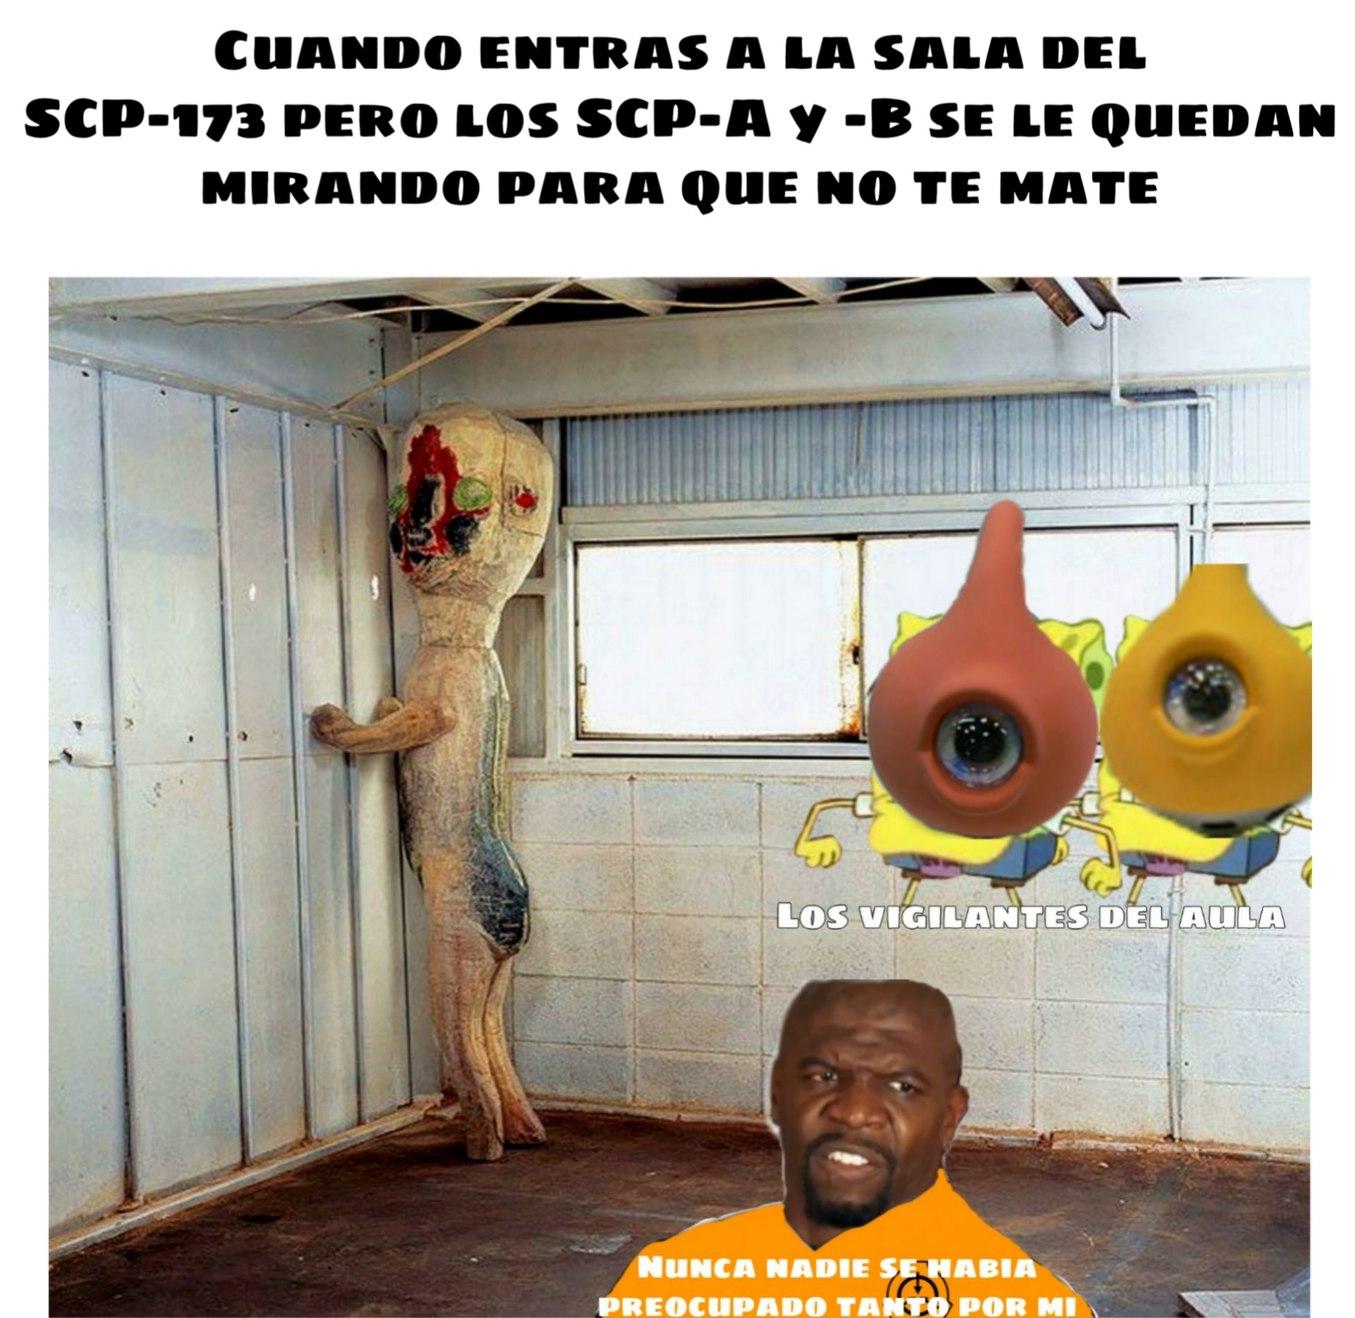 SCP - meme